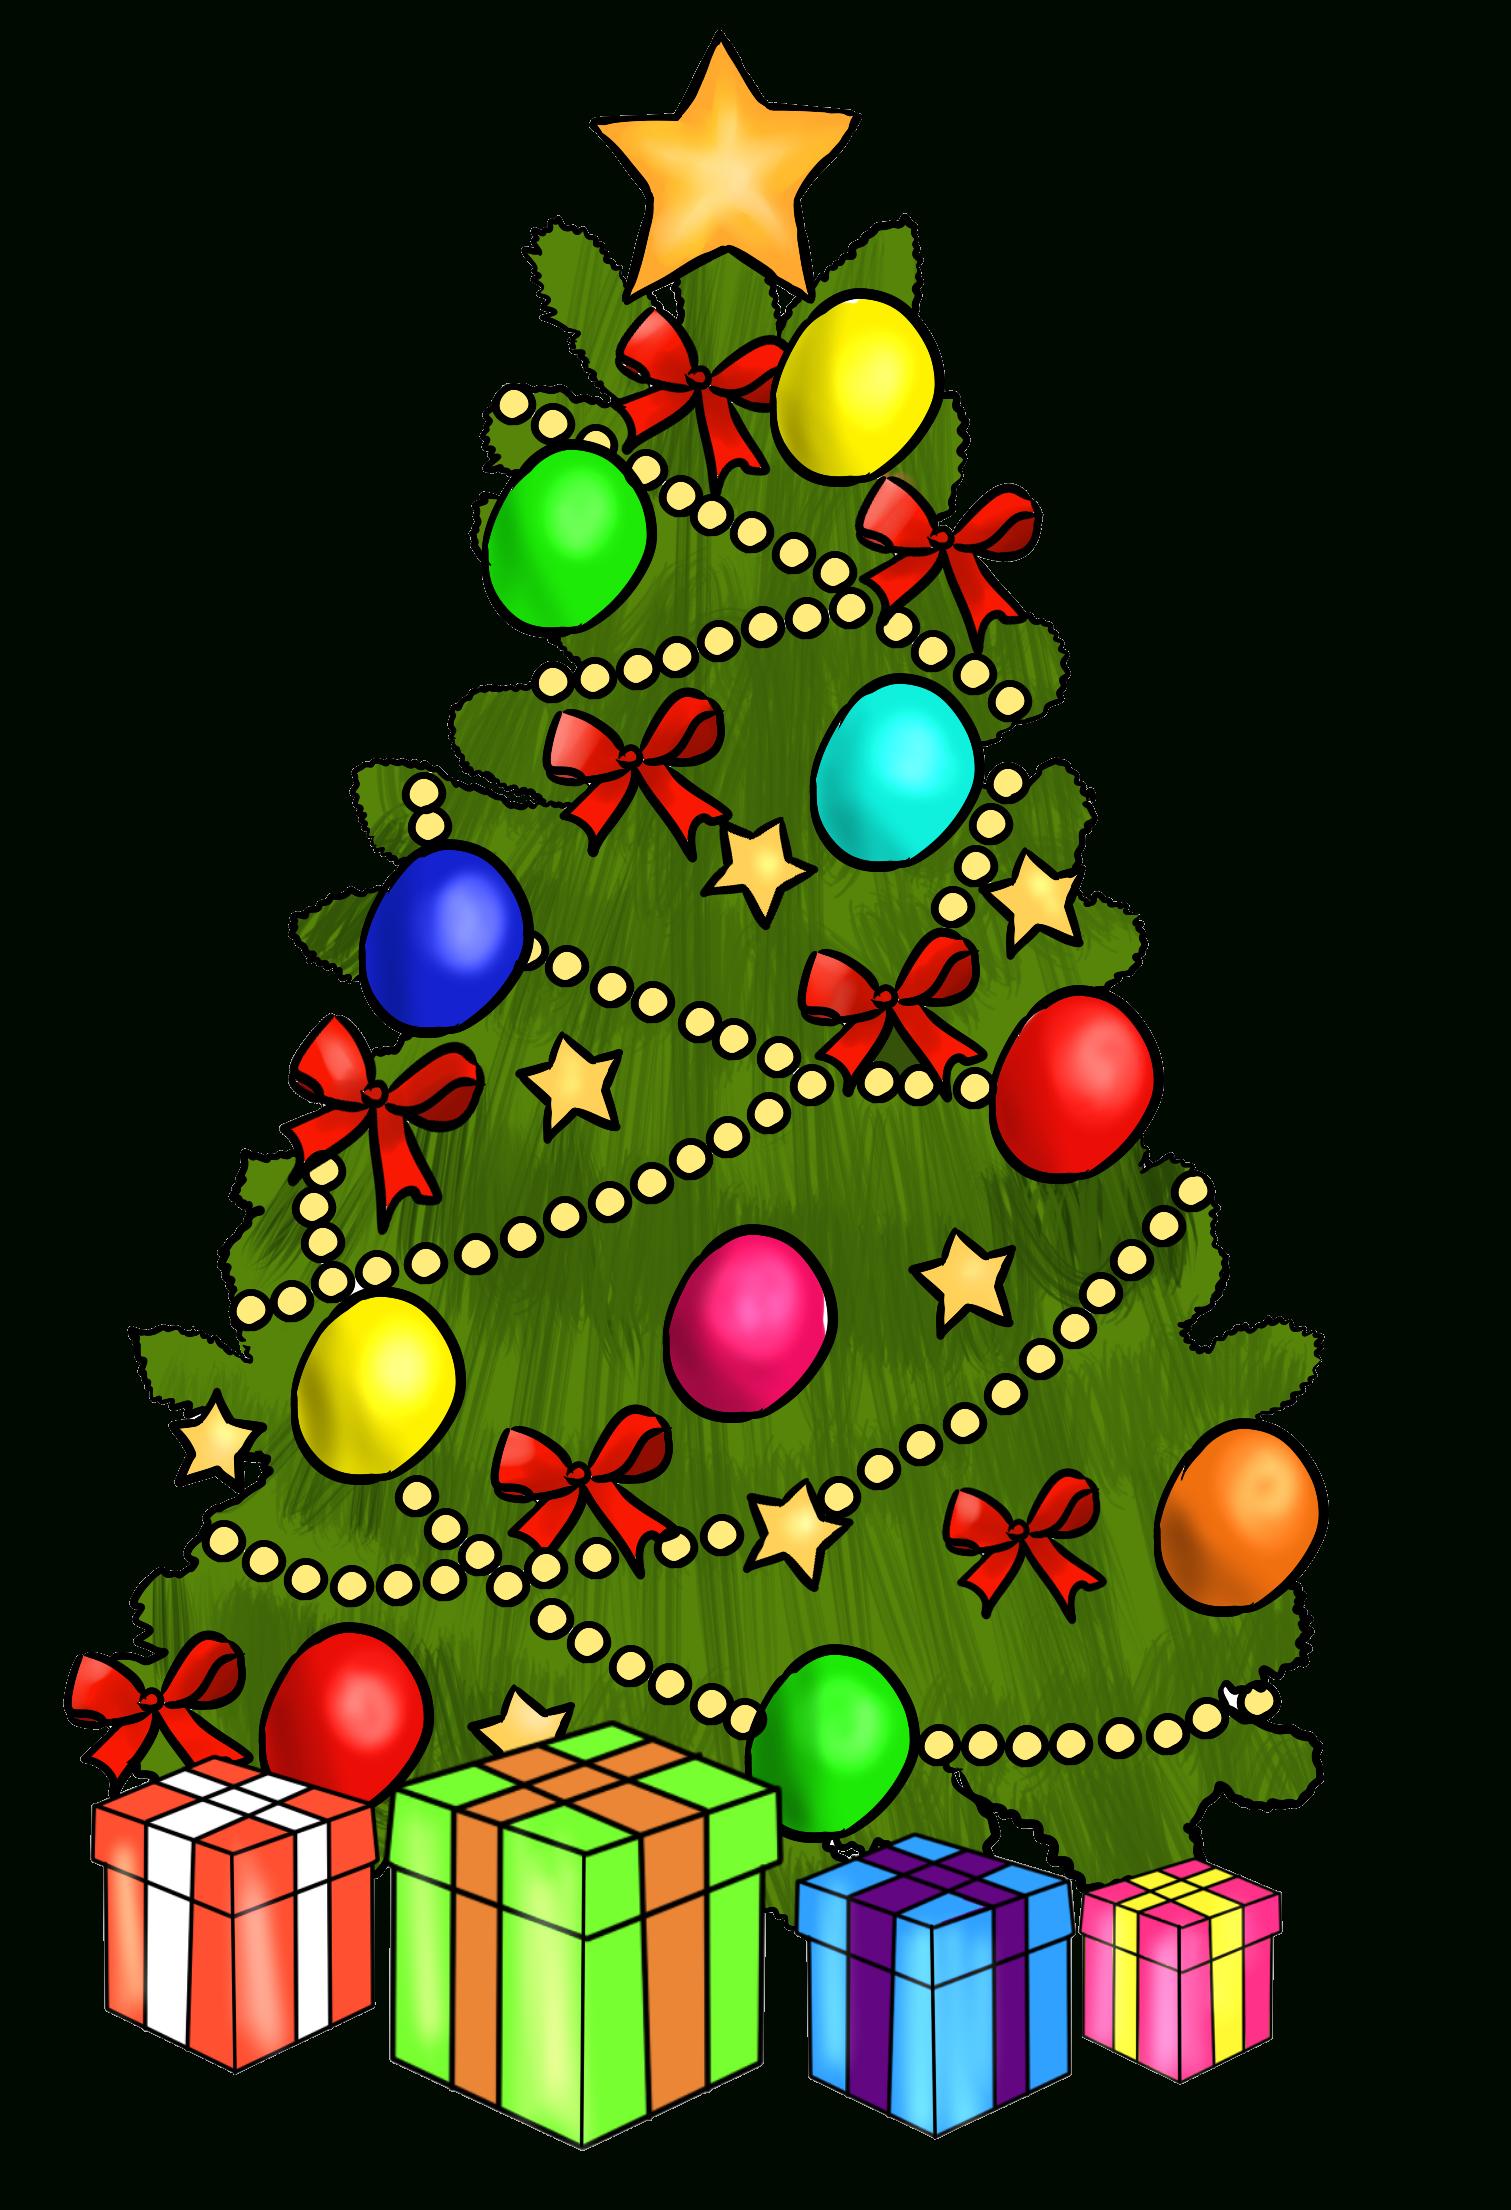 Free animated christmas clipart jpg transparent Free Christmas Clipart Animated Christmas Clip Art Santa Image with ... jpg transparent